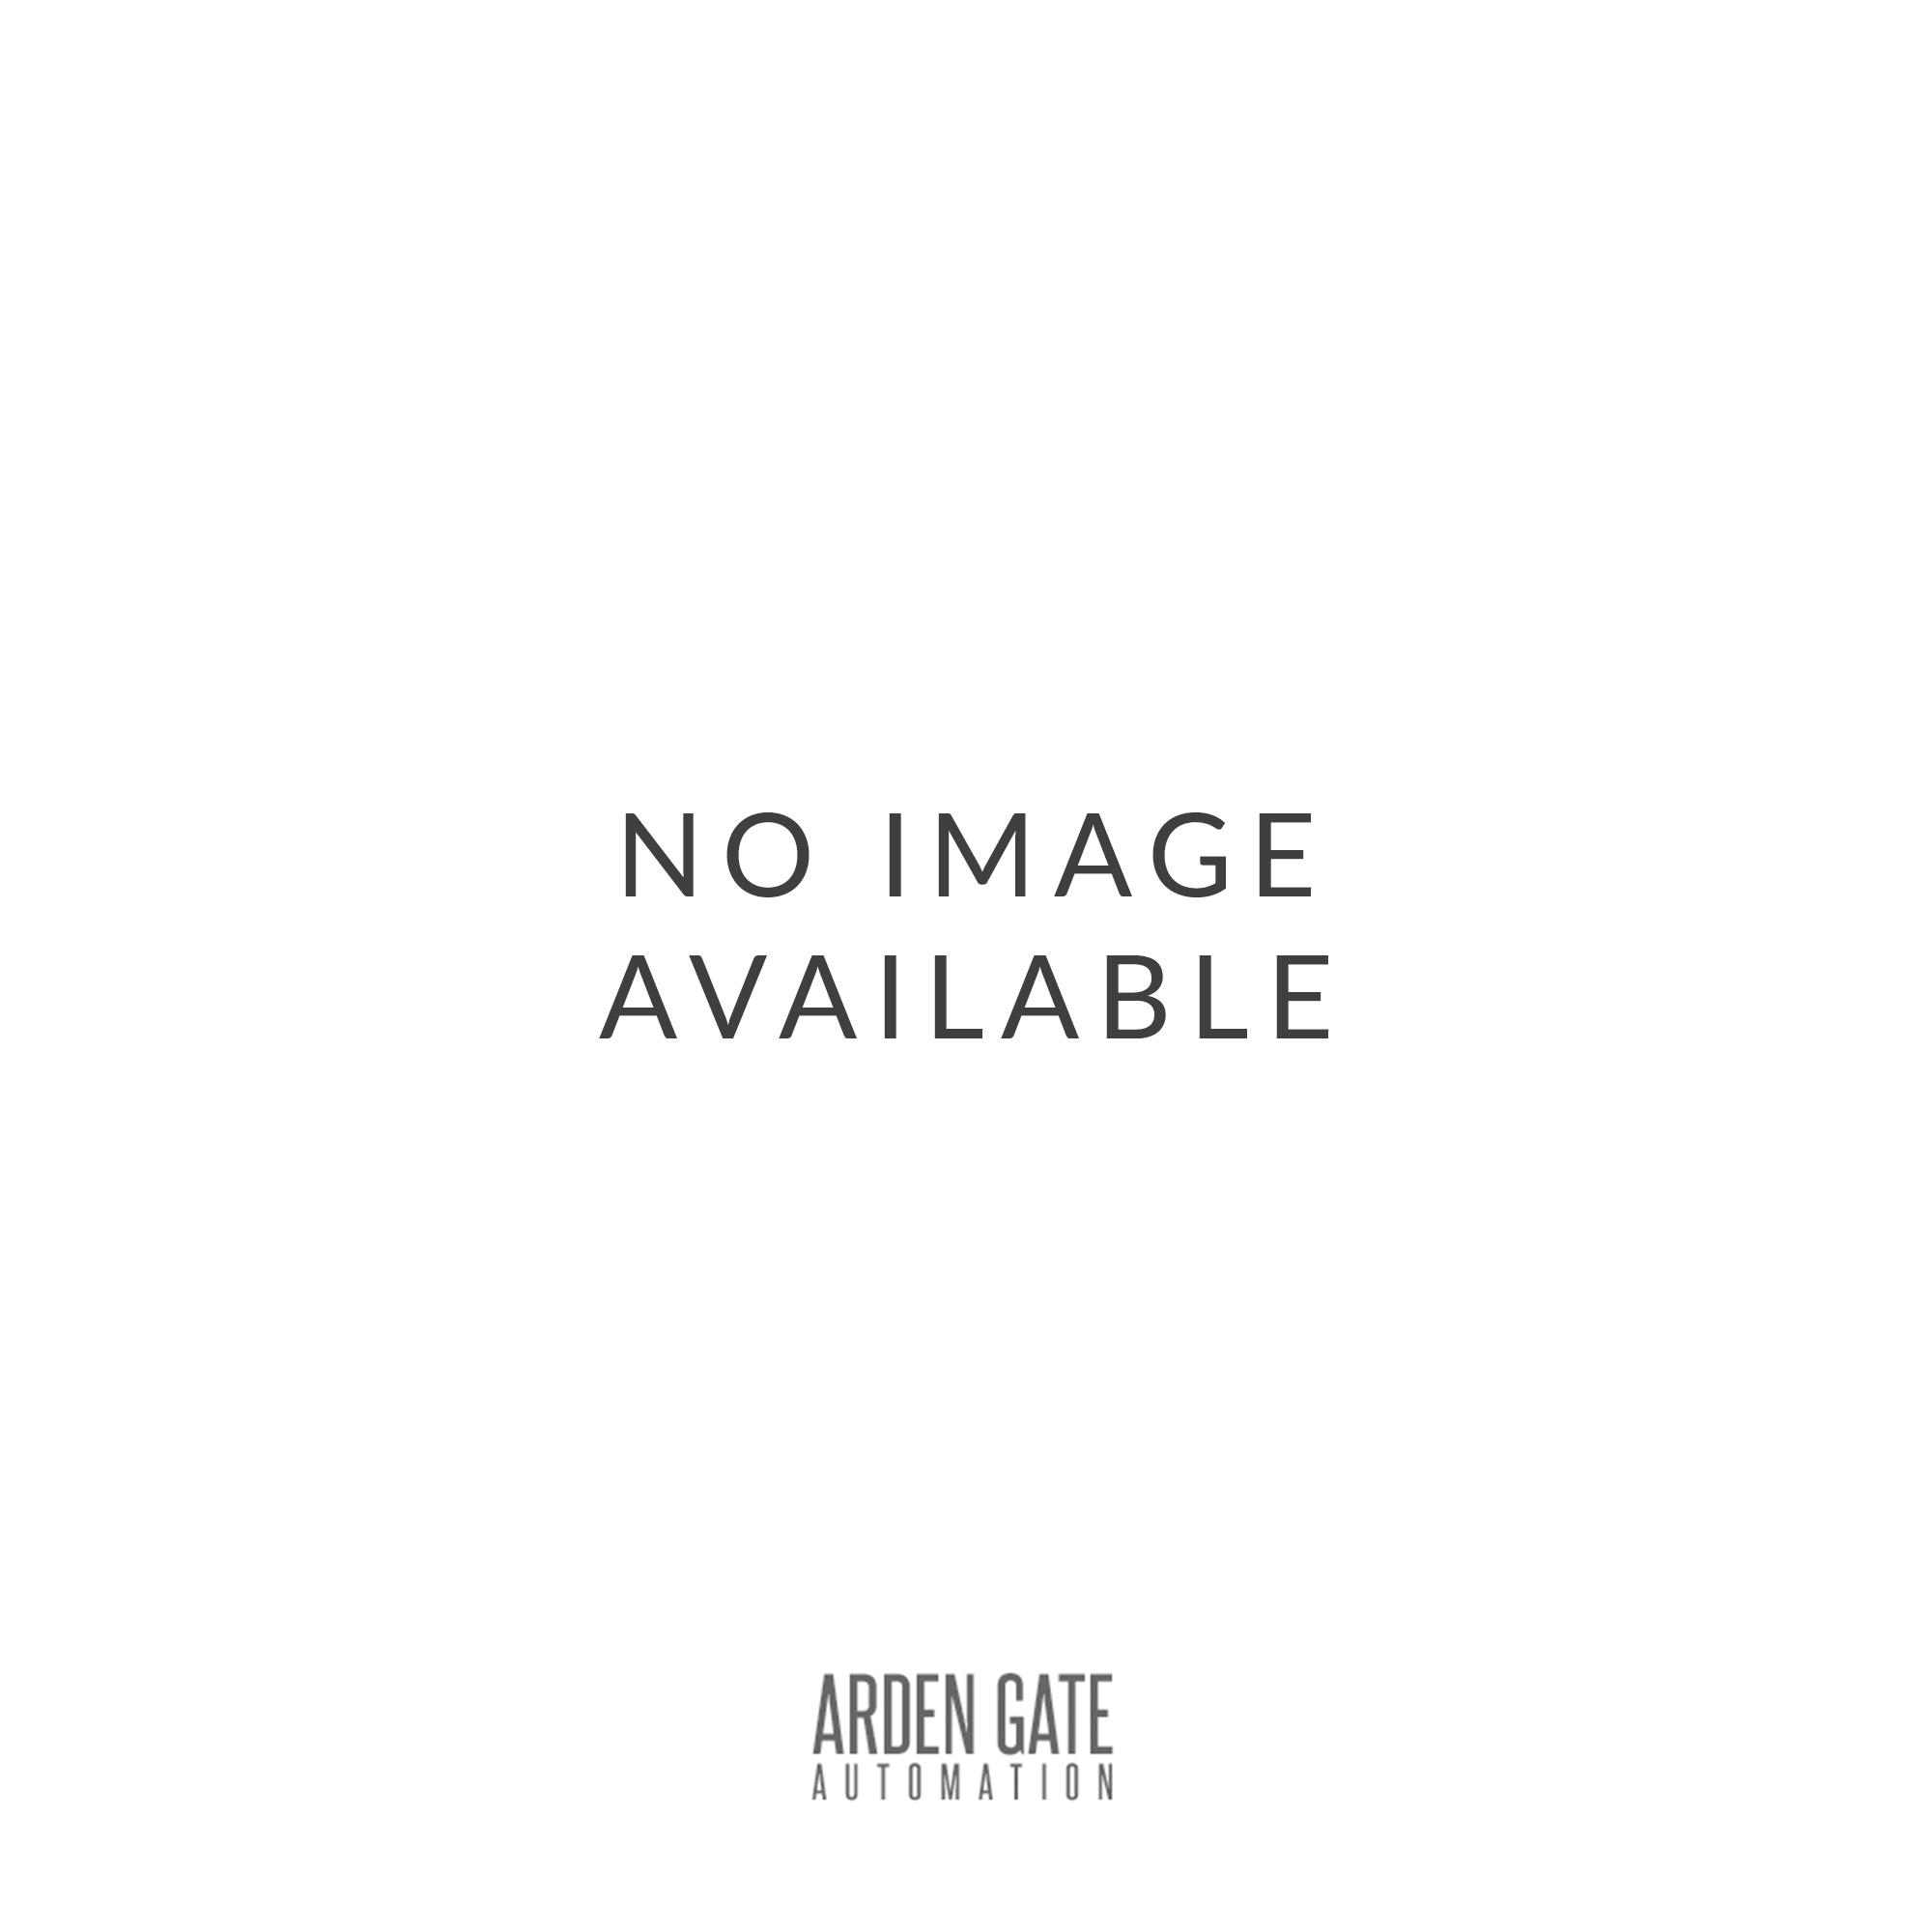 785104 XP 20 D ajustable wall photocells